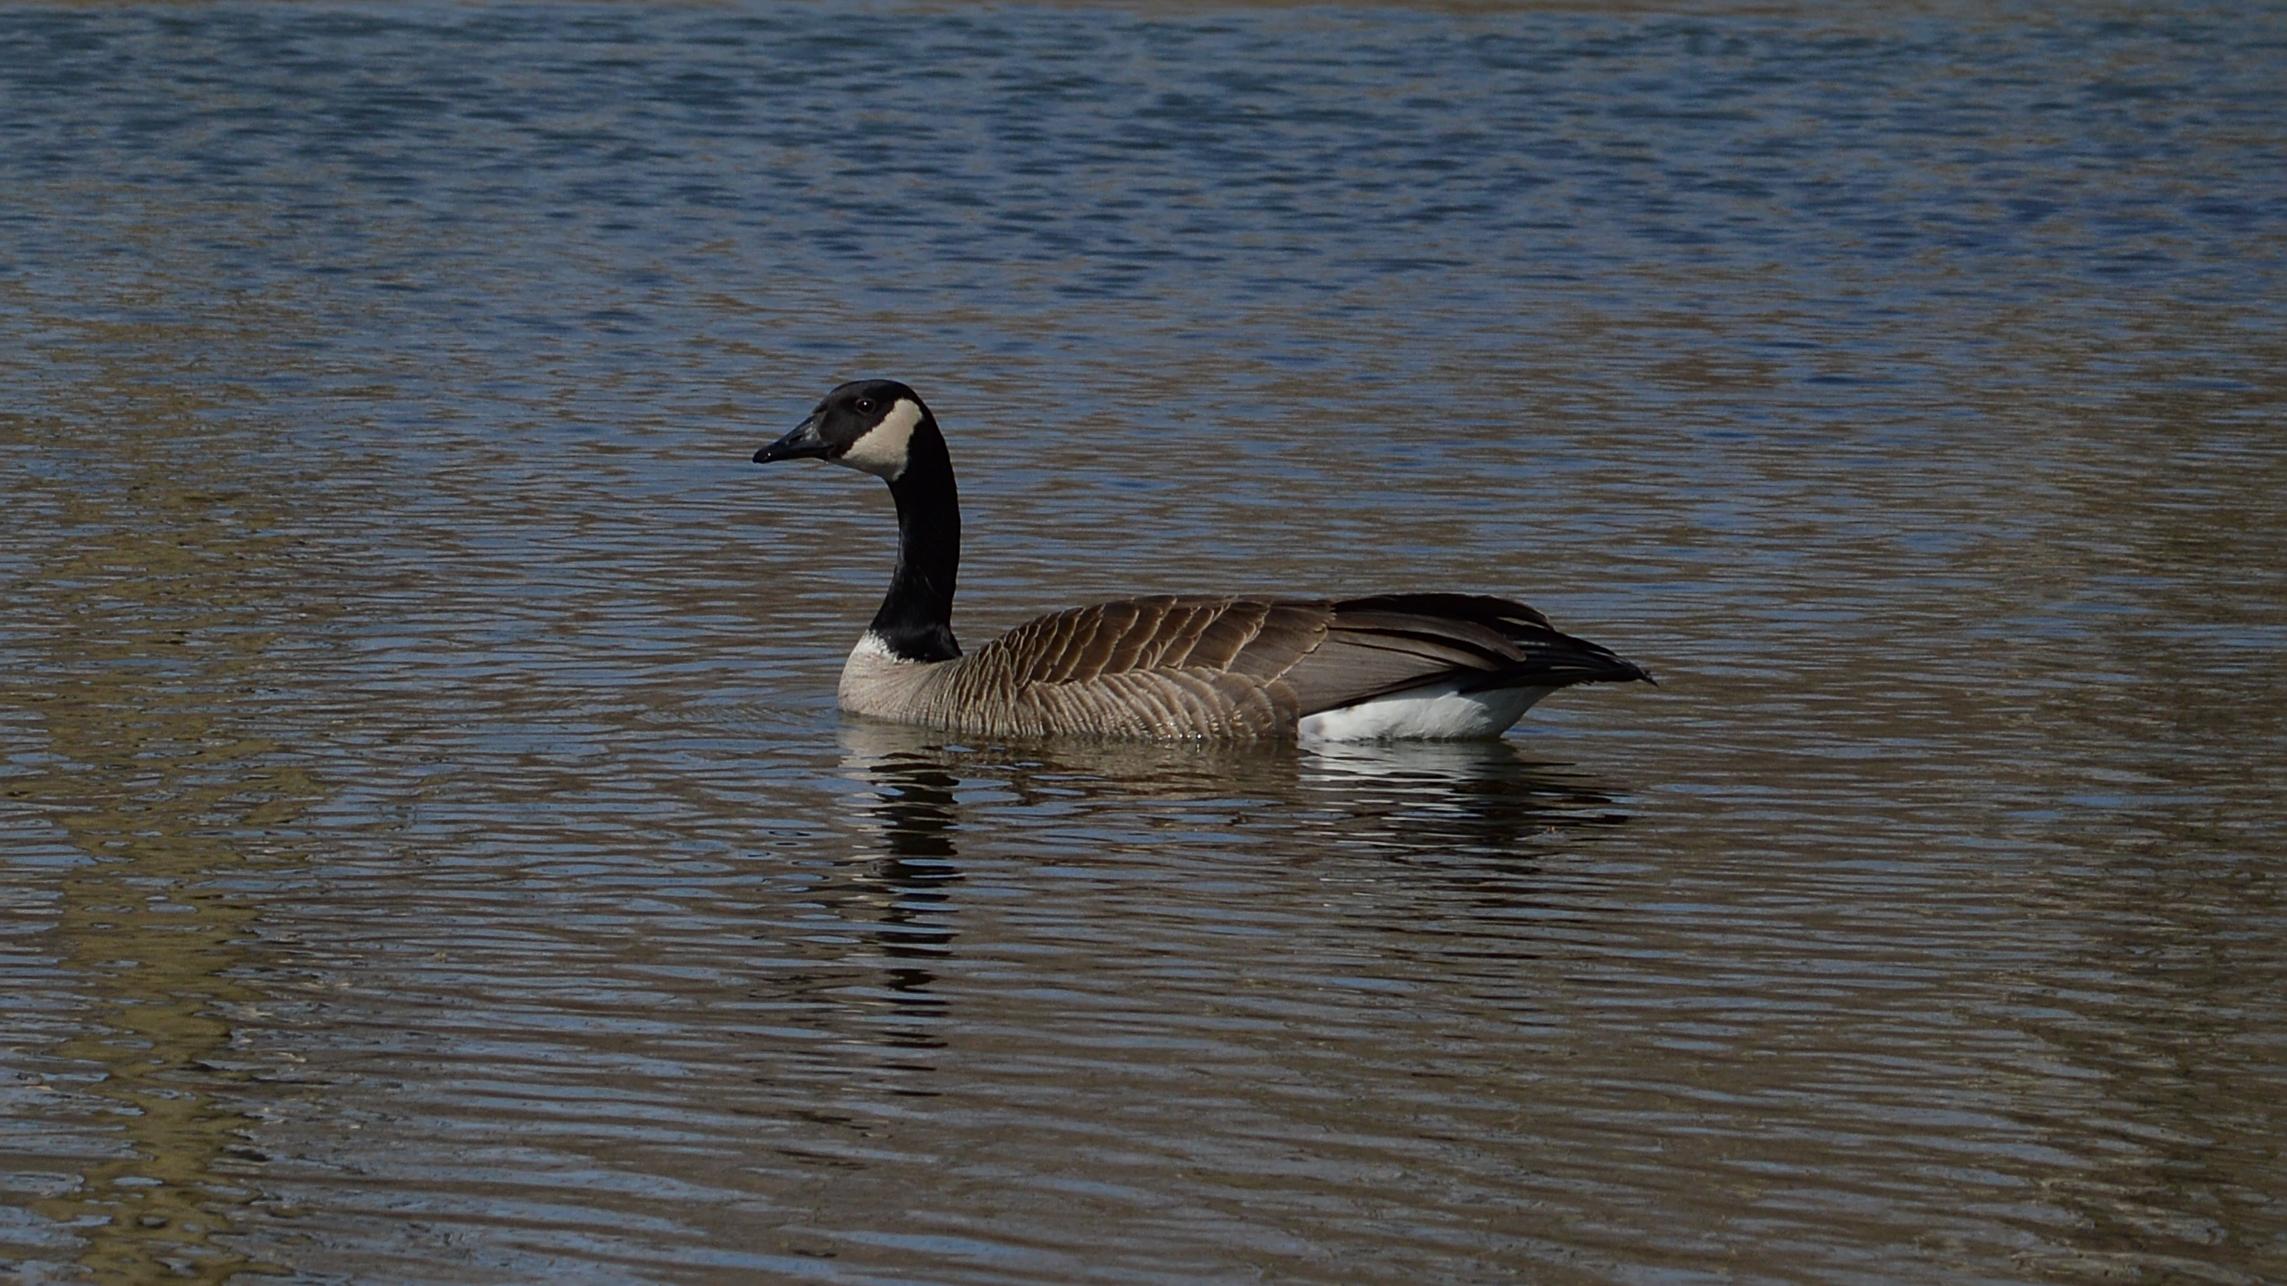 Canada Goose langford parka replica 2016 - File:Canada Goose (Branta canadensis) - London, Ontario 01.jpg ...